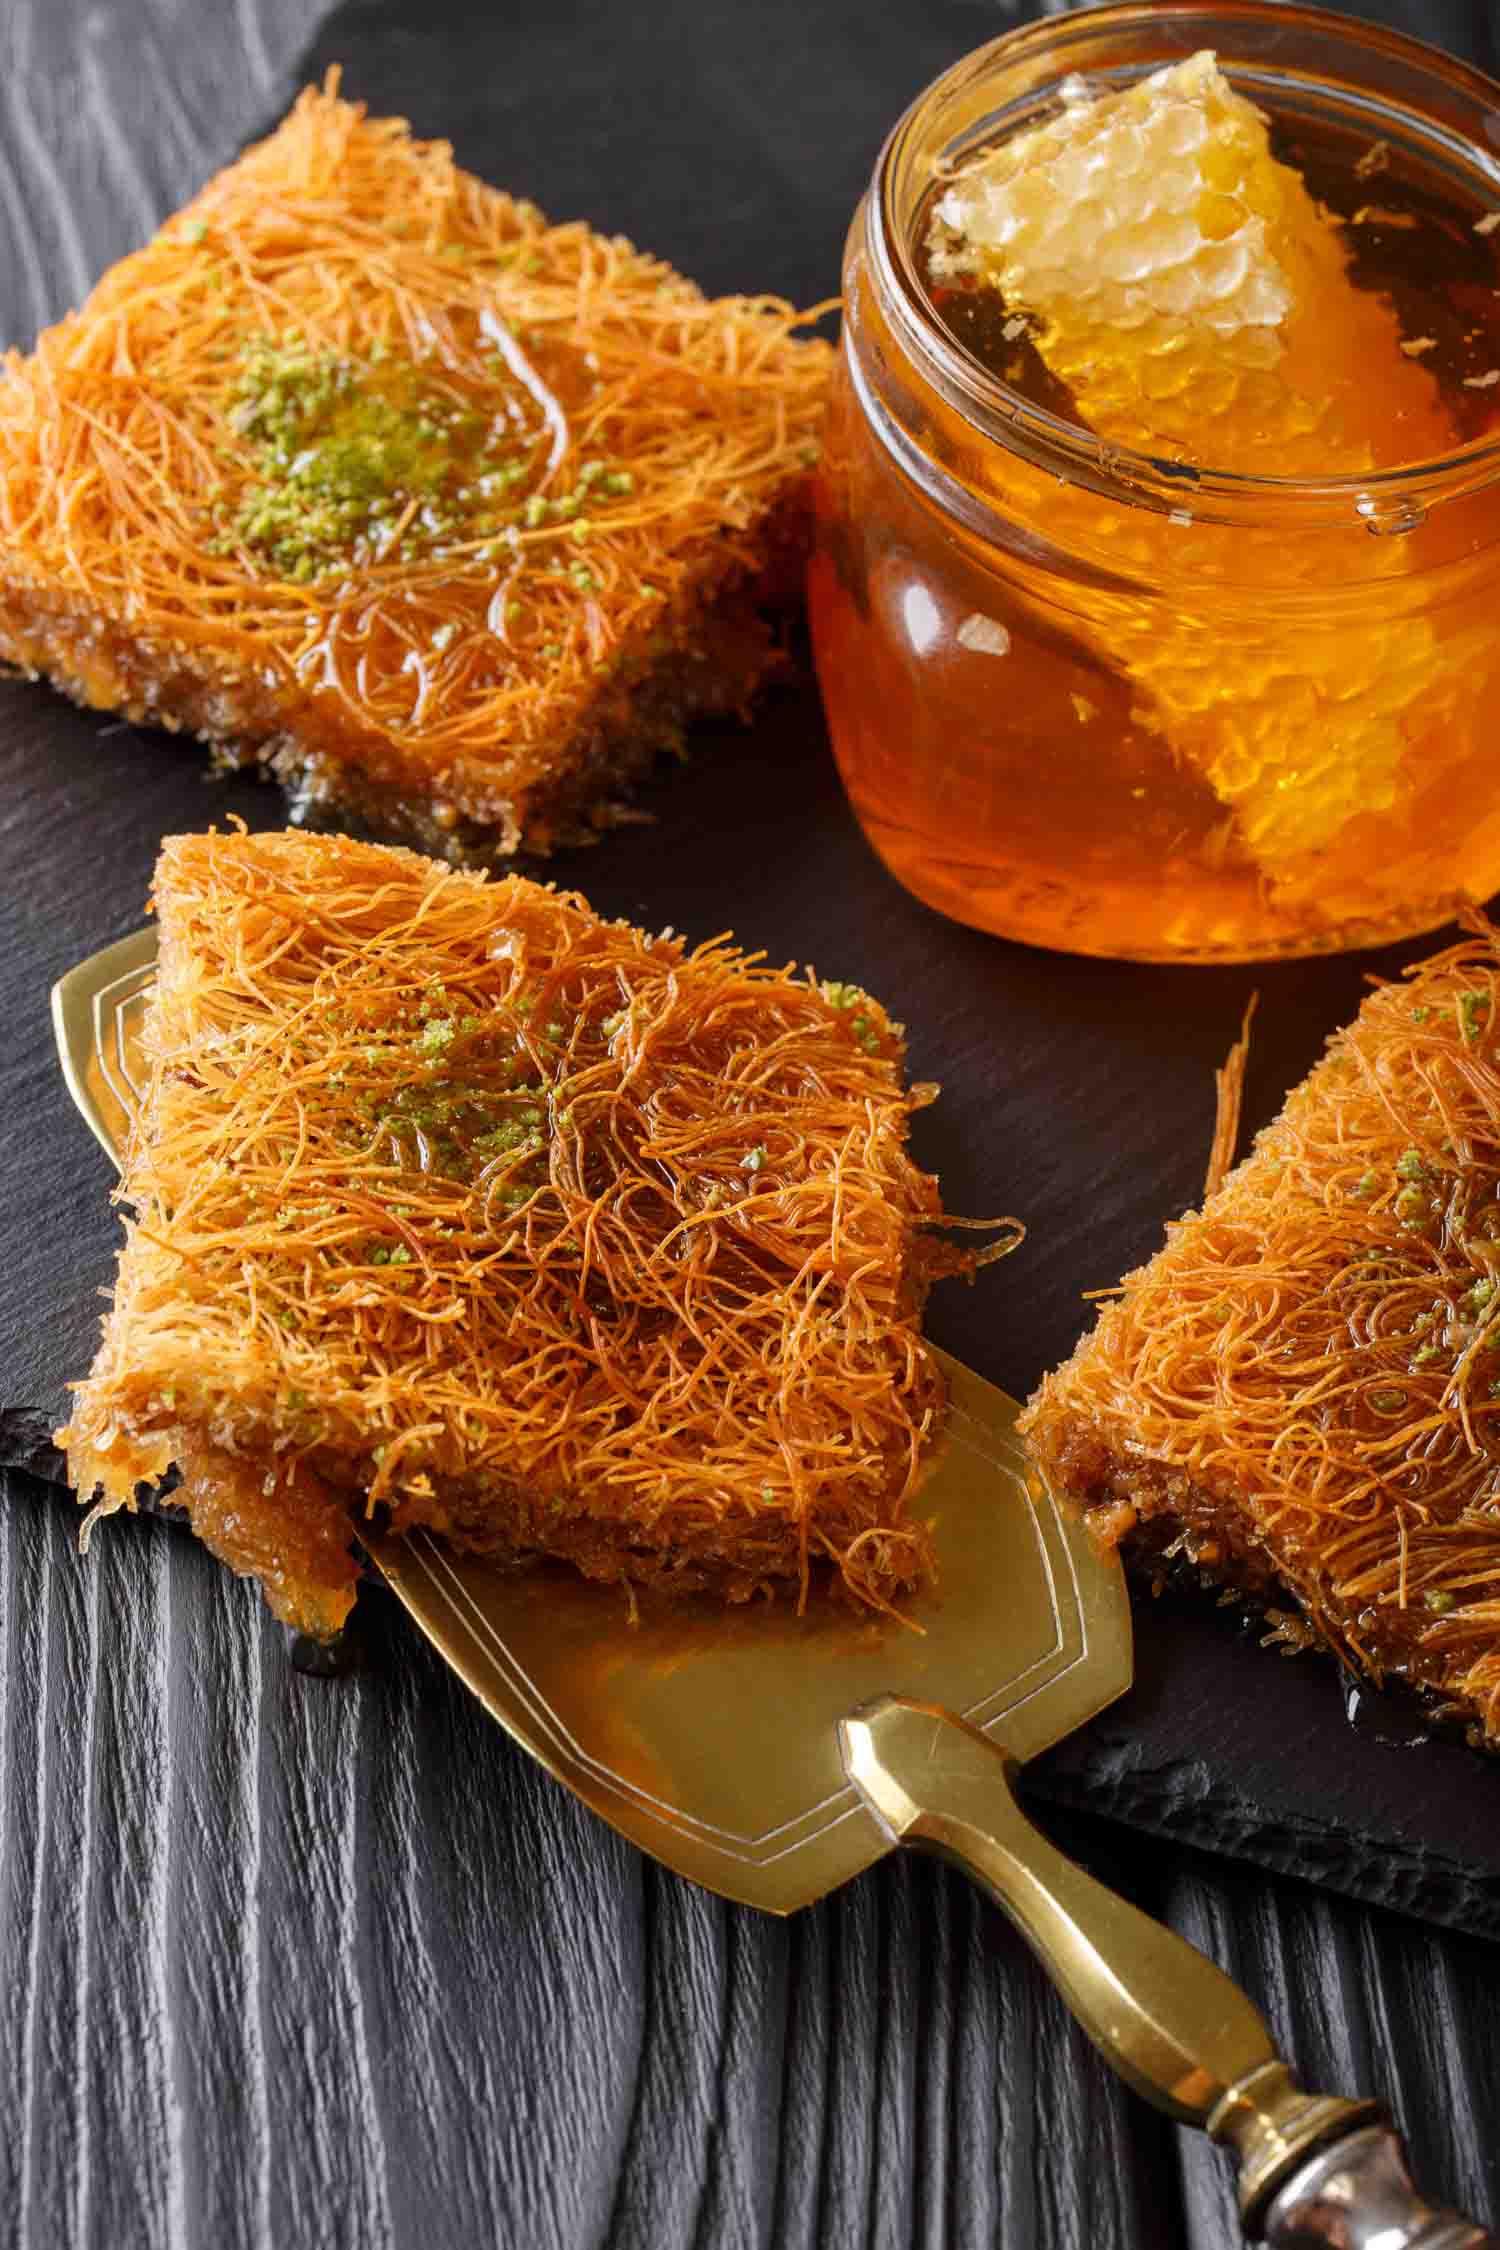 Food in Jordan, Traditional Arabic pastry cake with pistachio named kadaif or kataifi closeup. Vertical